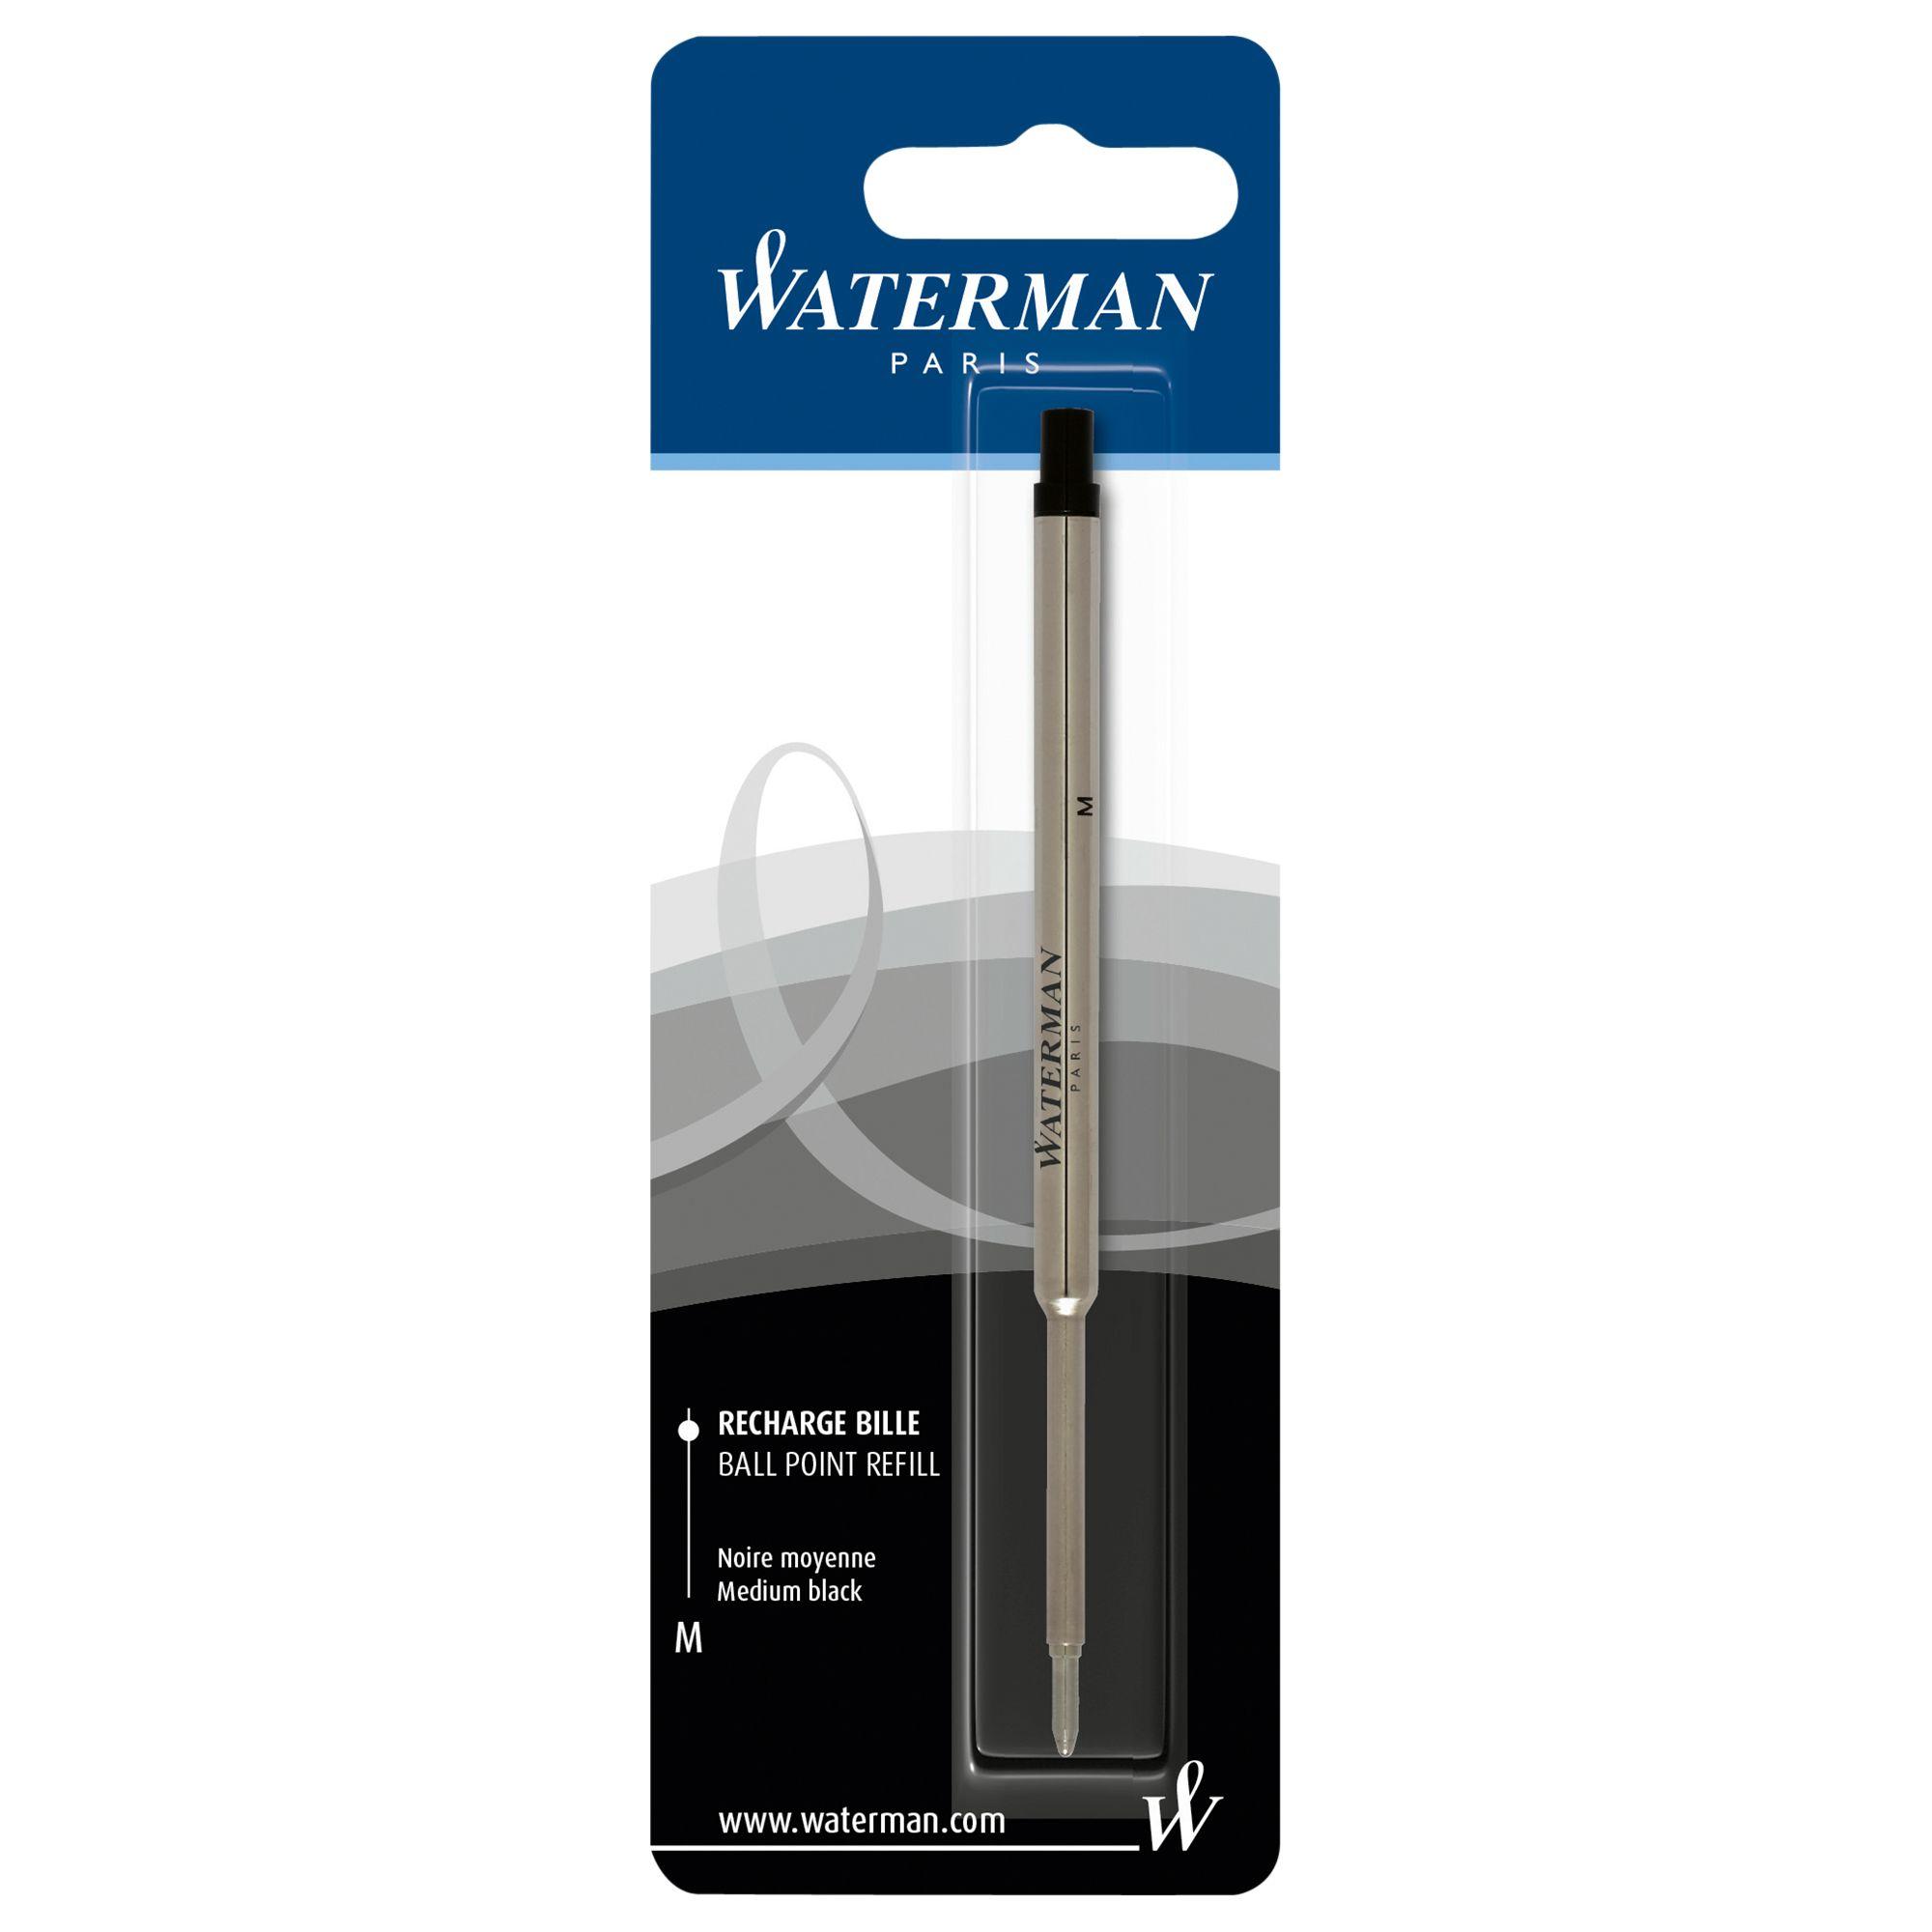 Waterman Waterman Ballpoint Refill, Black, Medium